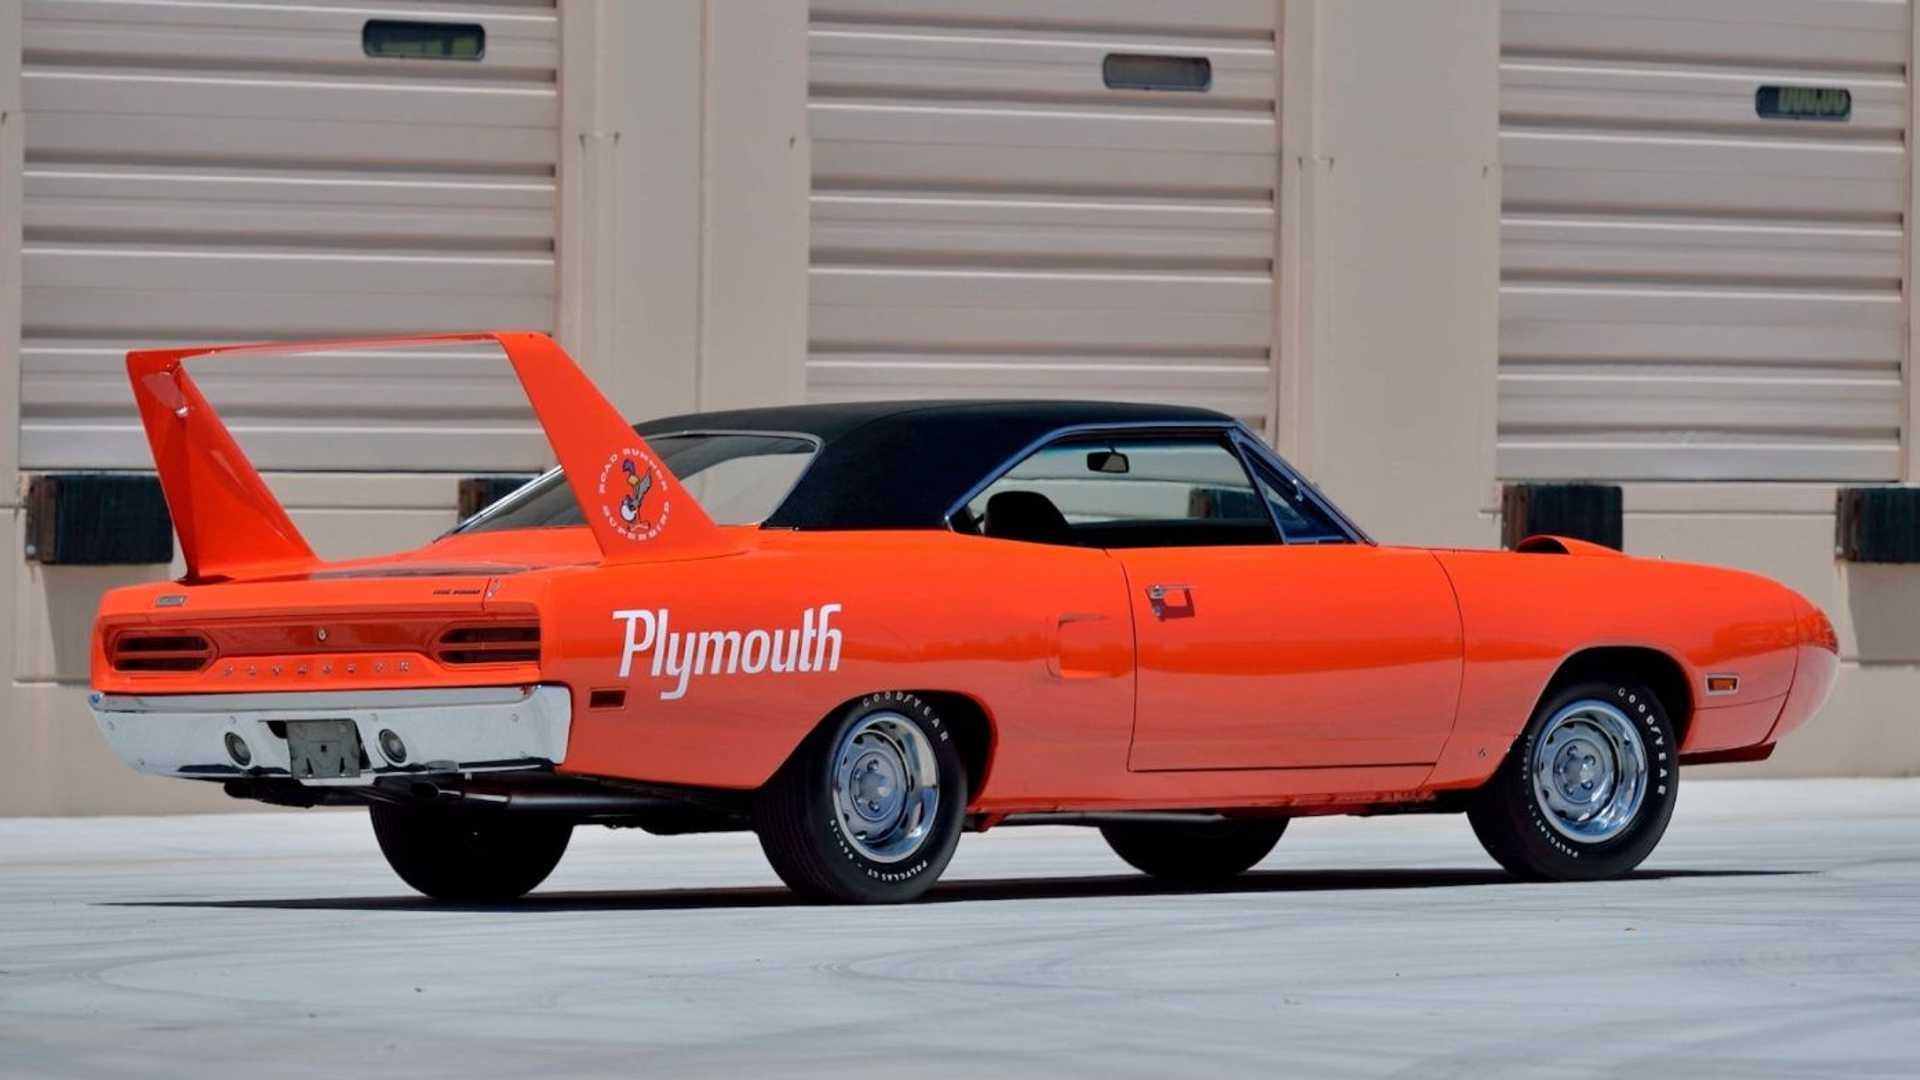 Plymouth Superbird 70'